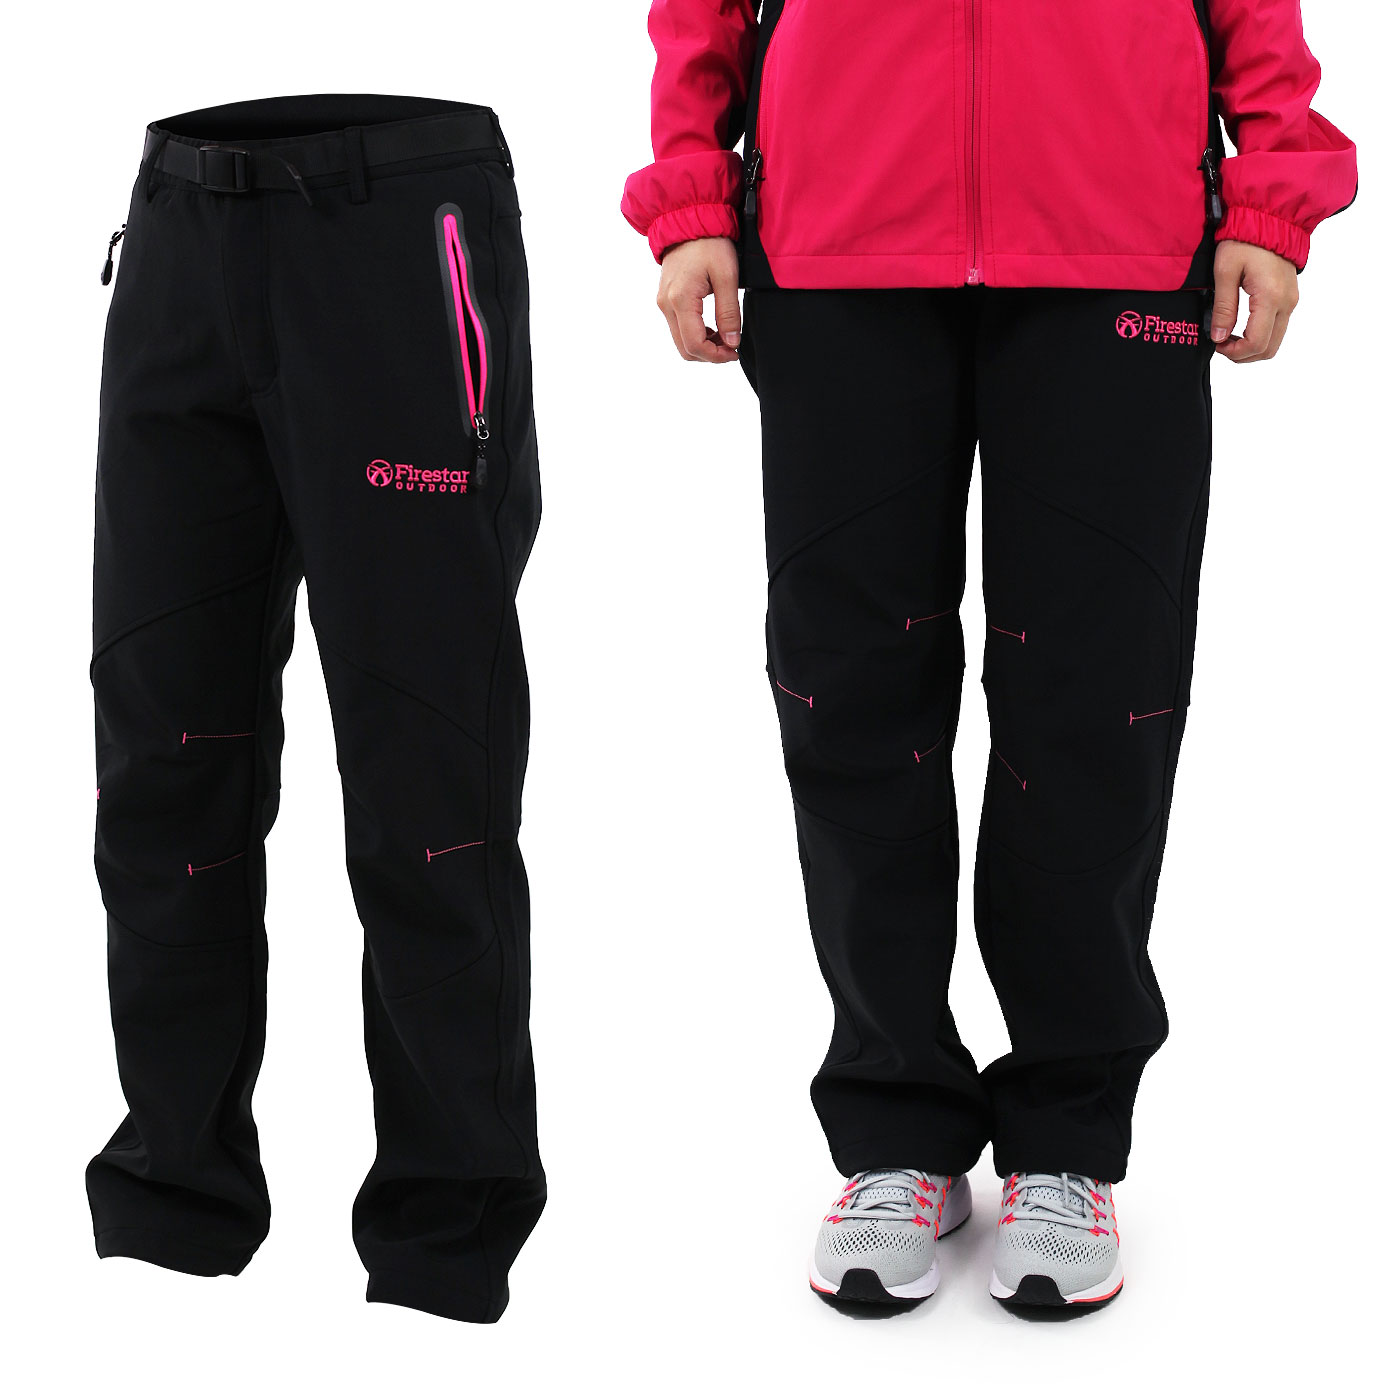 FIRESTAR 女款彈性平織磨毛內裏長褲   PL682-10 - 黑亮粉紅